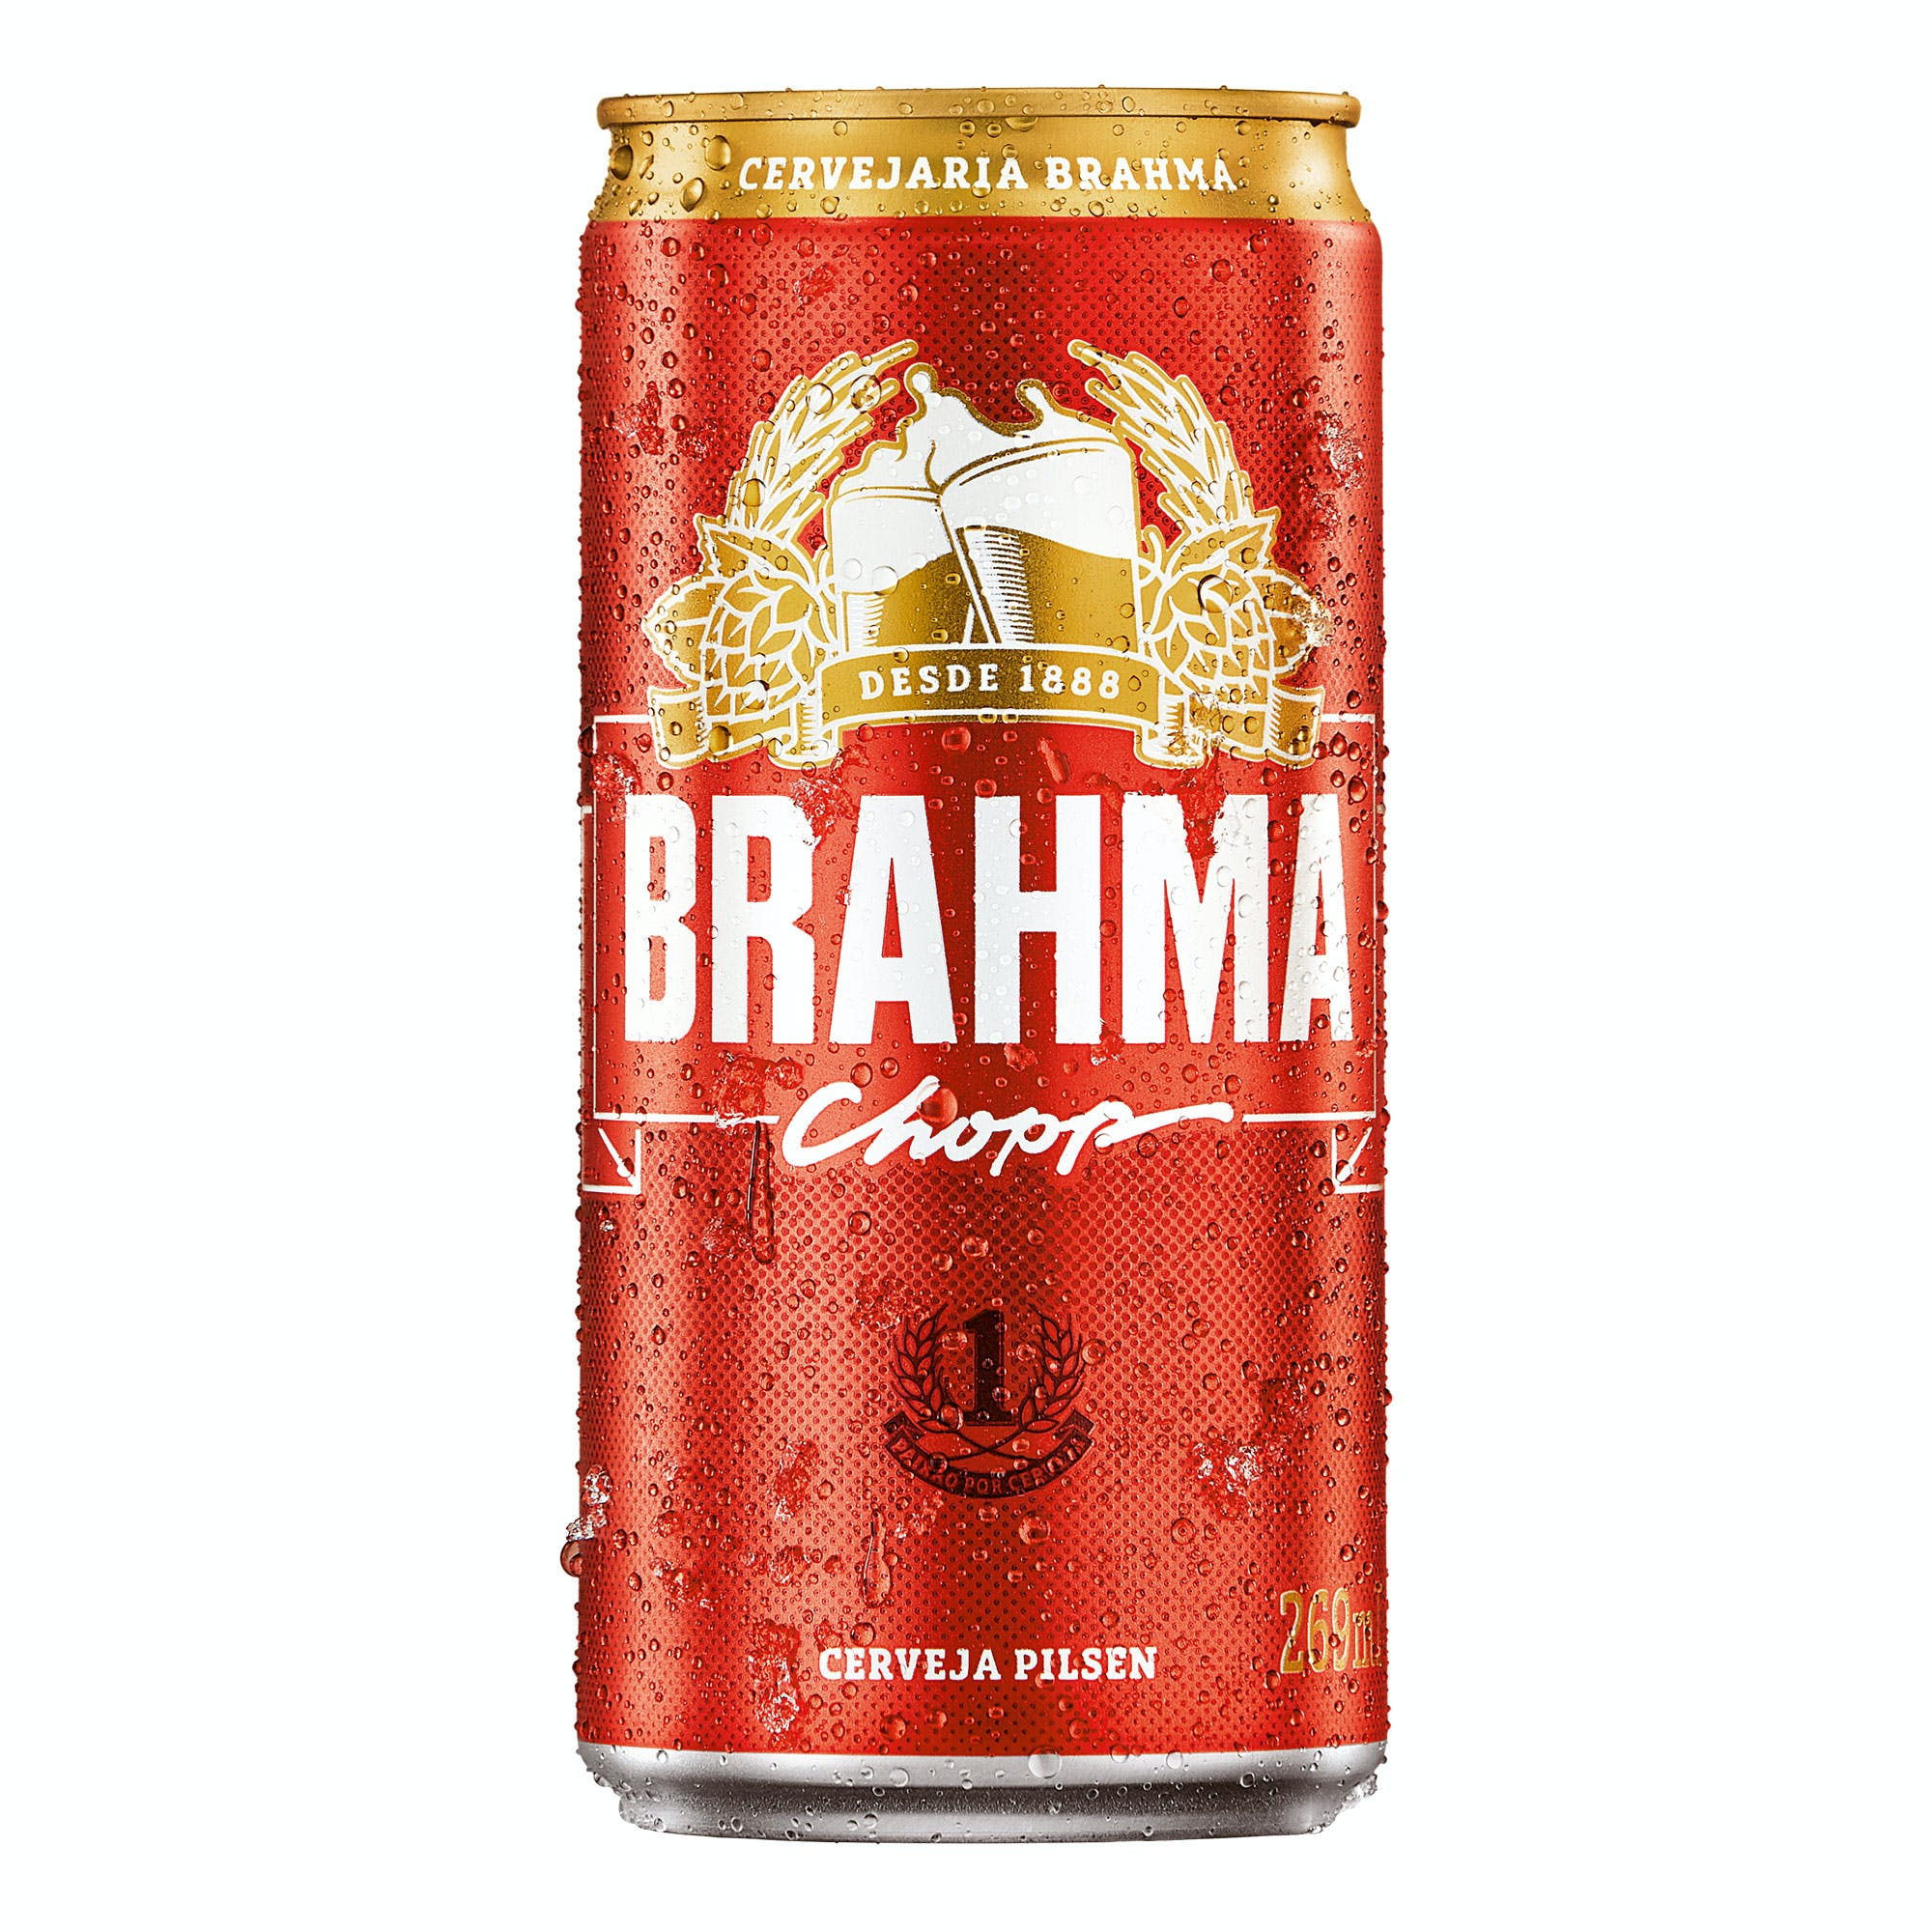 Brahma 269ml